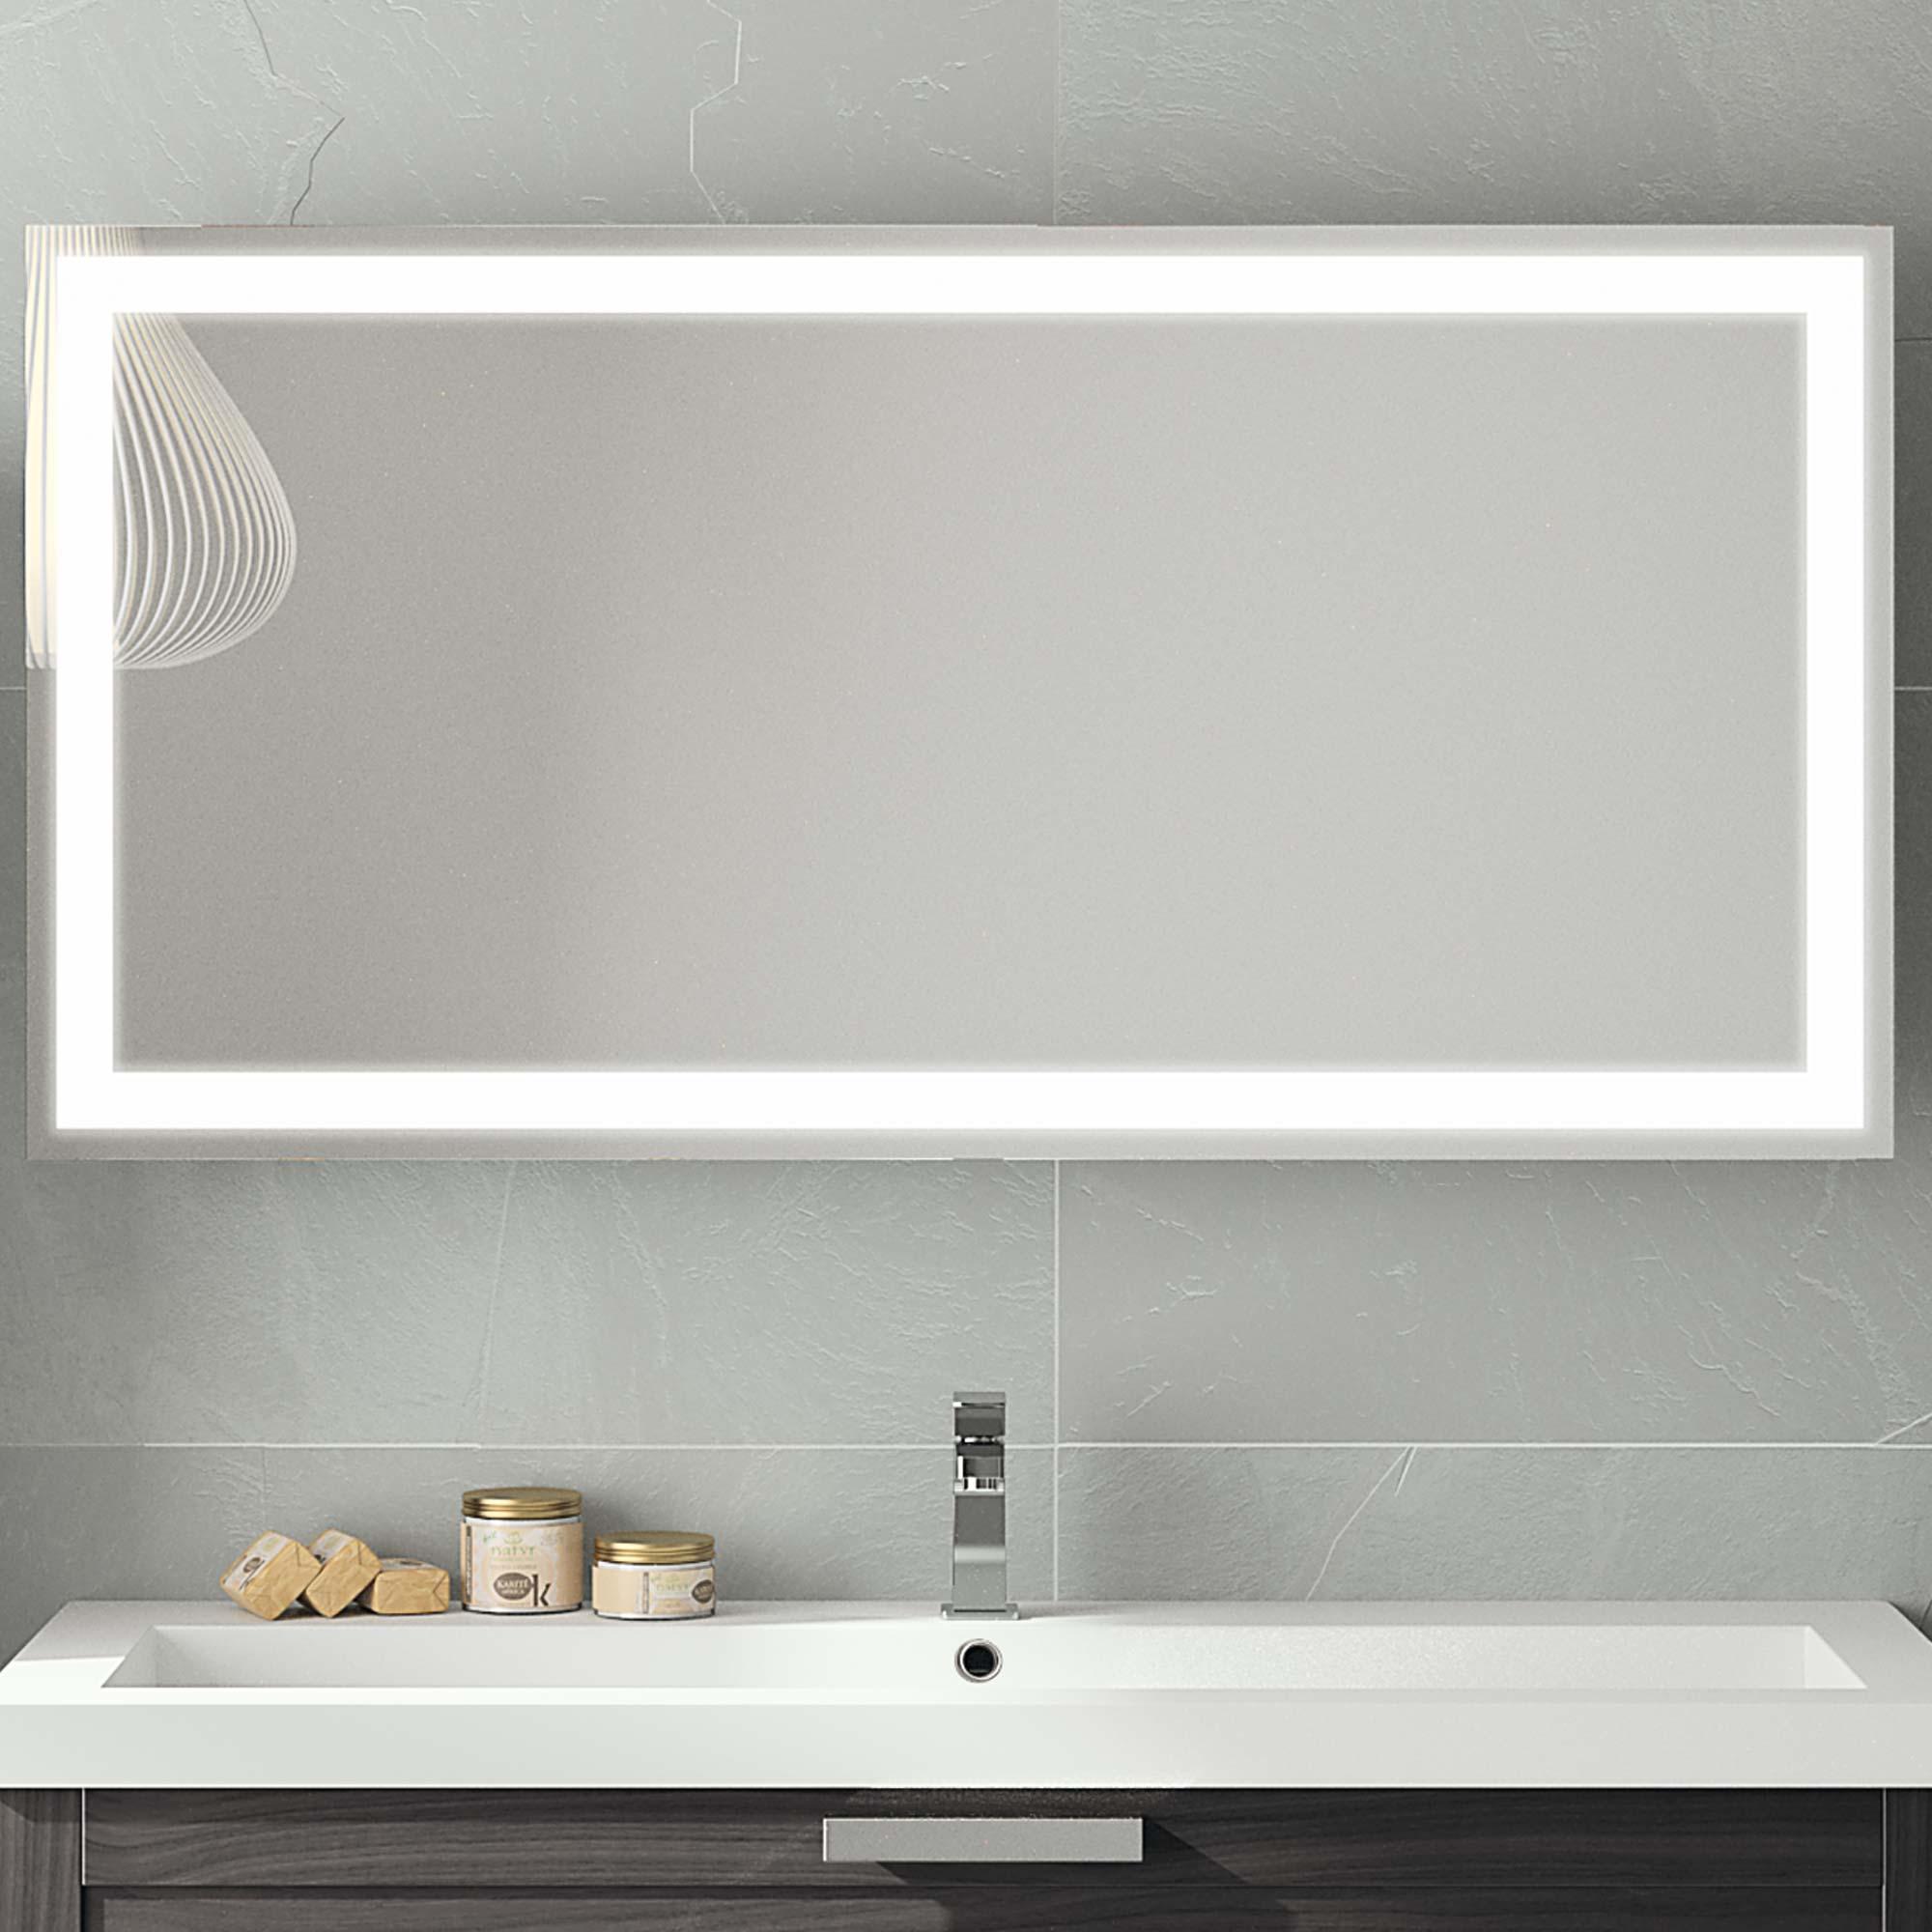 Miroir Salle De Bain 120 Cm miroirs led | meubles de salle de bains, baignoires